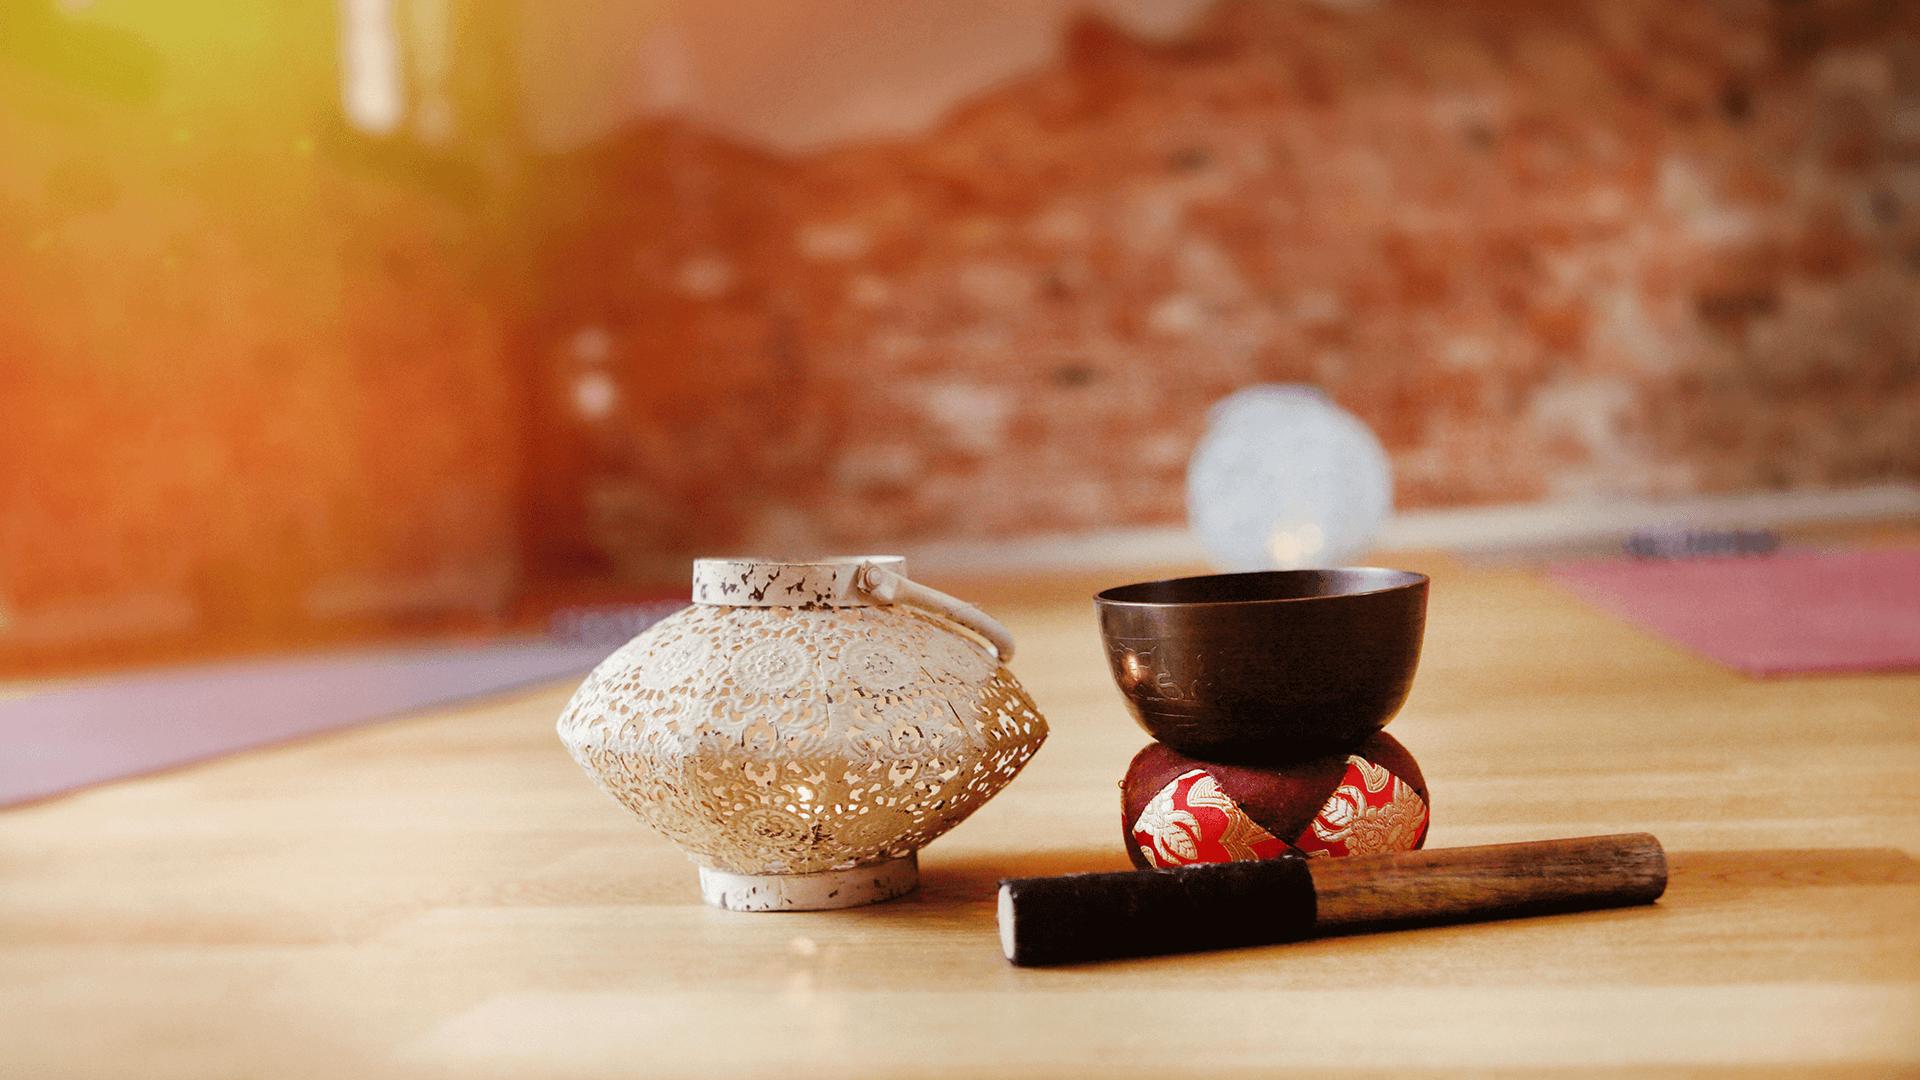 Nadiyoga-berlin-pankow-yogastudio-yoga-specials